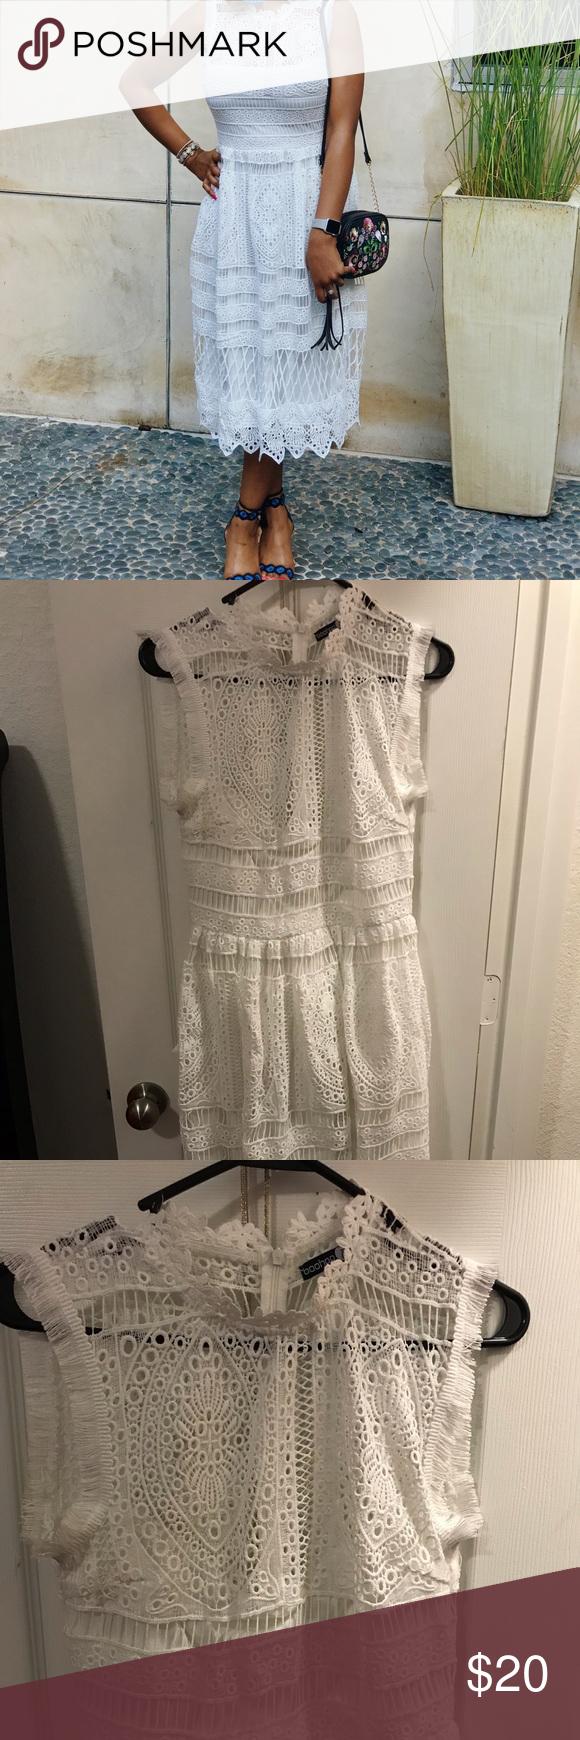 Boohoo White Lace Dress In 2020 Lace White Dress Lace Dress White Lace [ 1740 x 580 Pixel ]